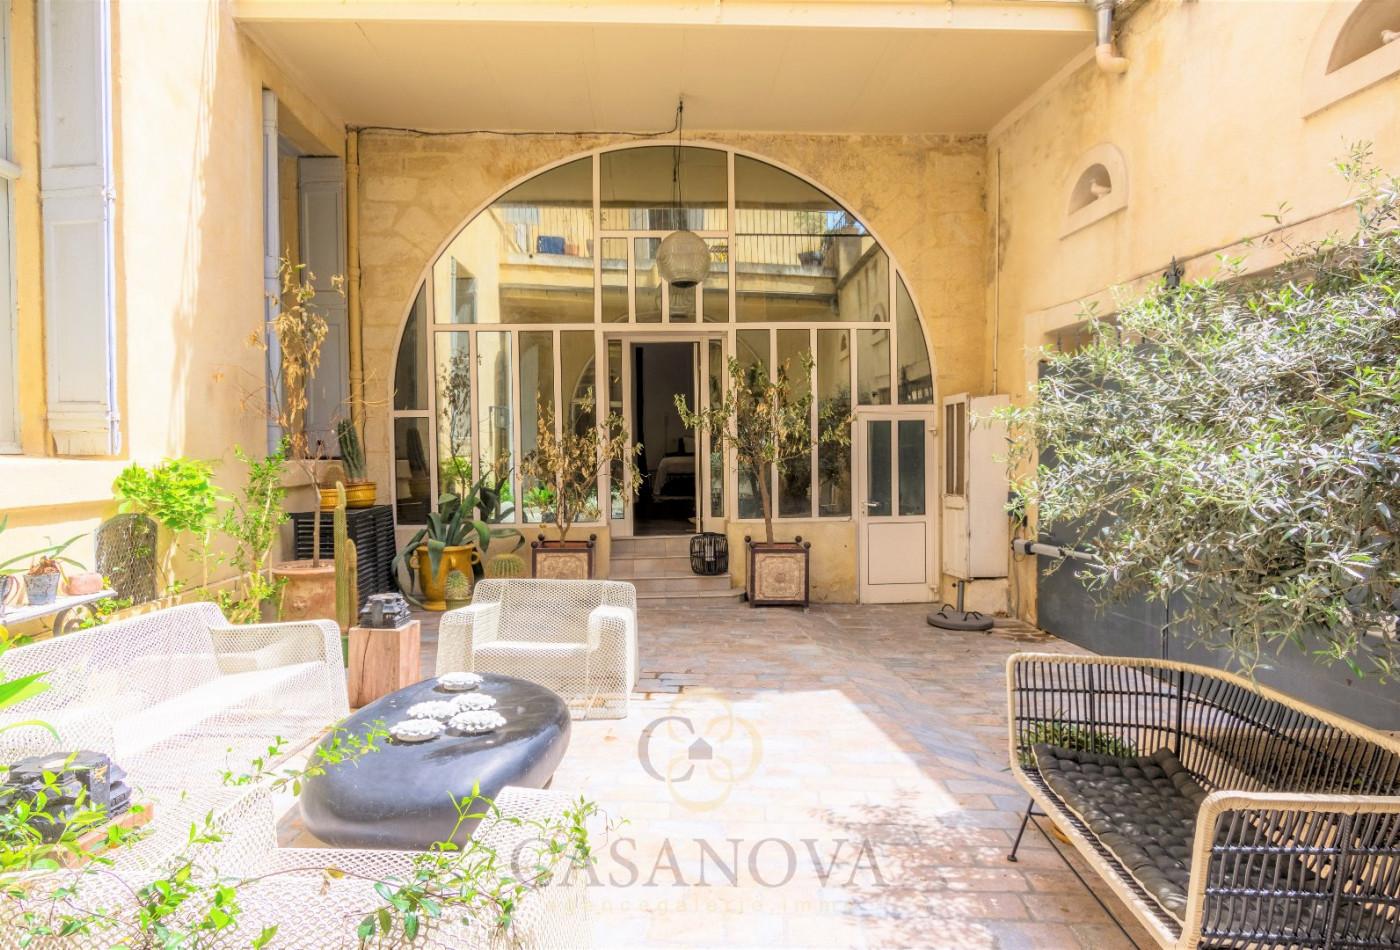 A vendre  Montpellier   Réf 340135009 - Agence galerie casanova